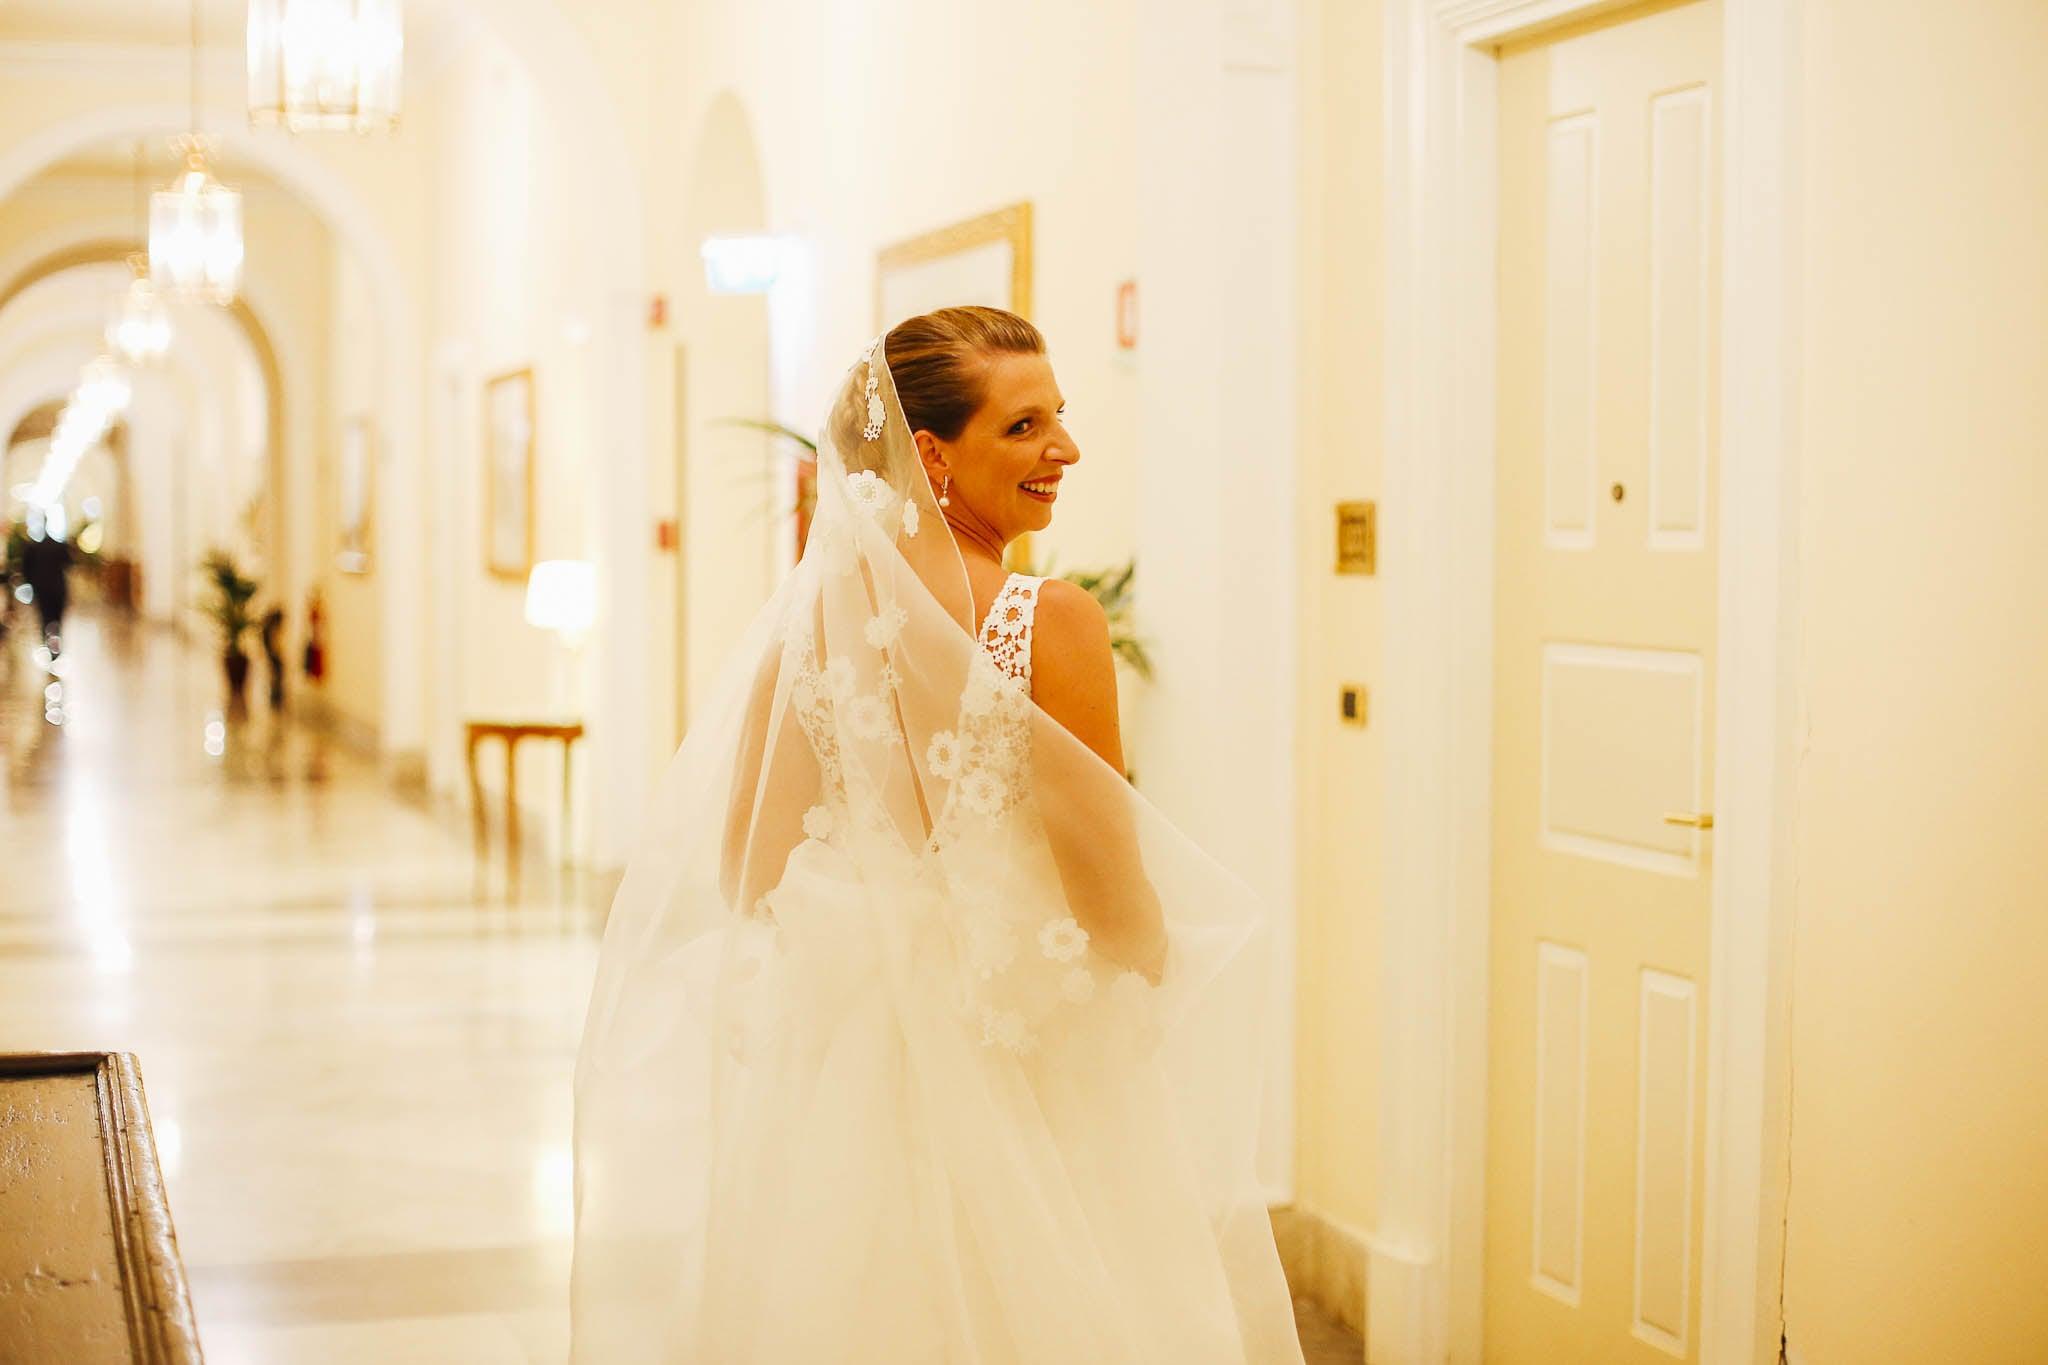 Sofia Gangi Wedding Planner Palermo Matrimonio Villa Igea preparativi Marco Lavinia (8)-min